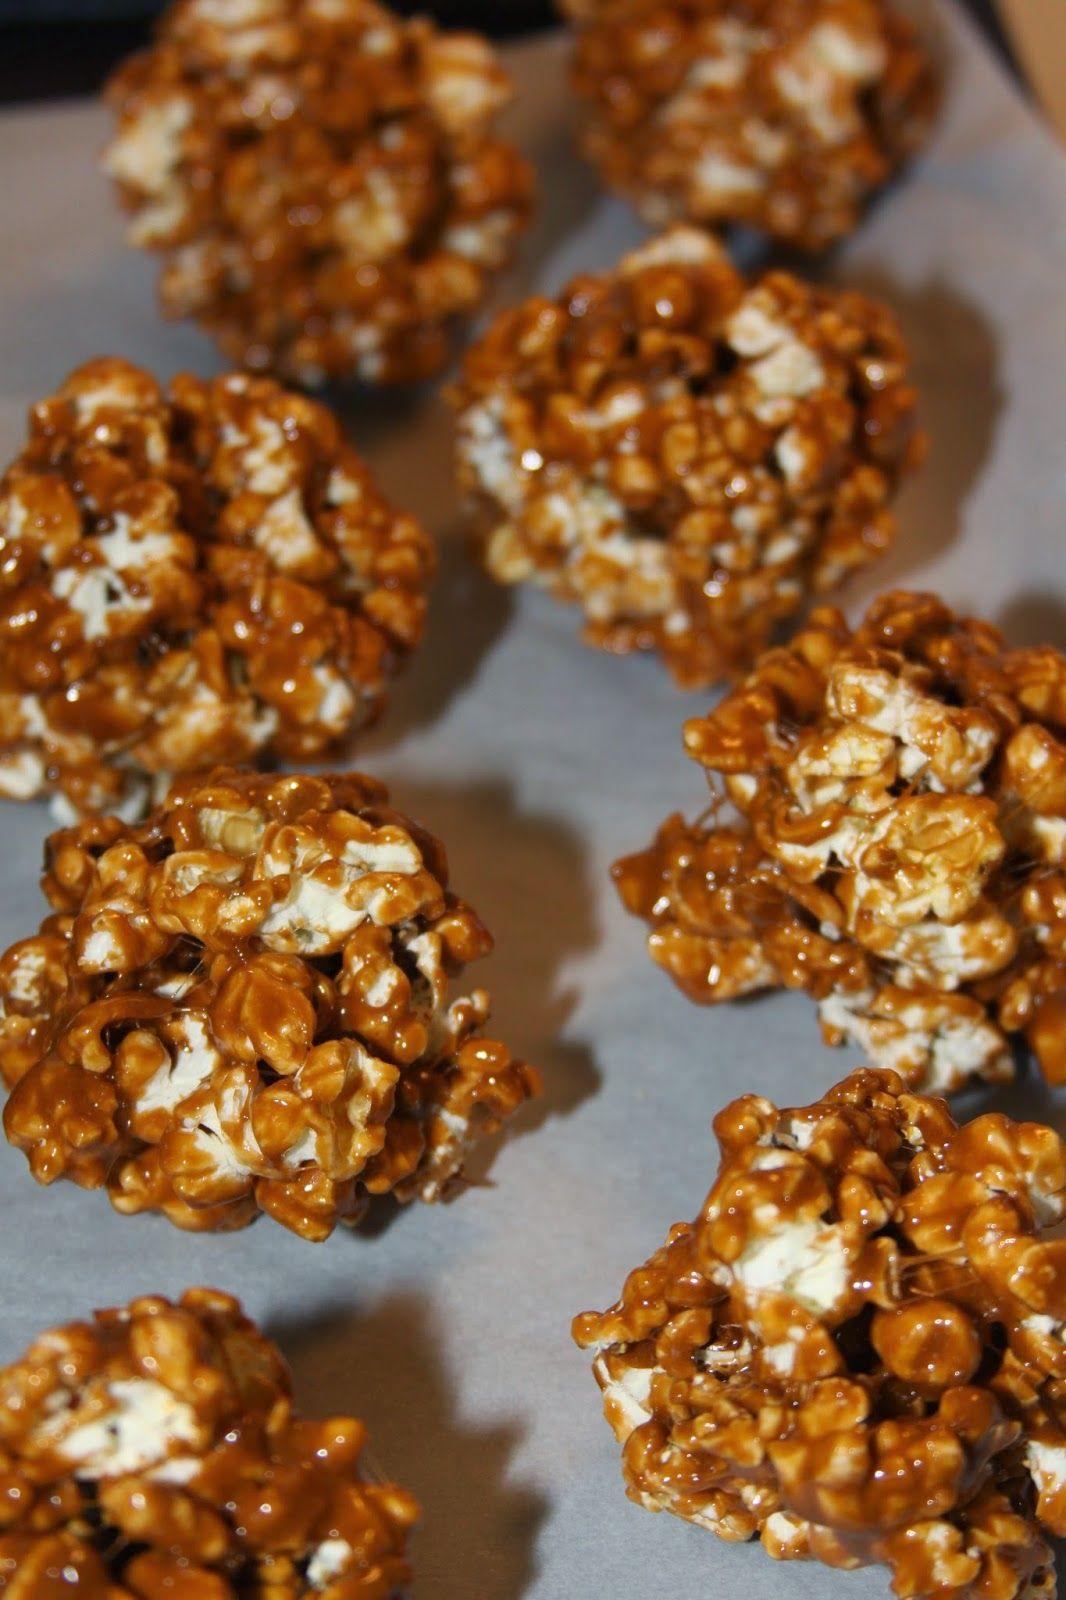 Pumpkin Spice Marshmallow Popcorn Oh Sweet Basil #healthymarshmallows